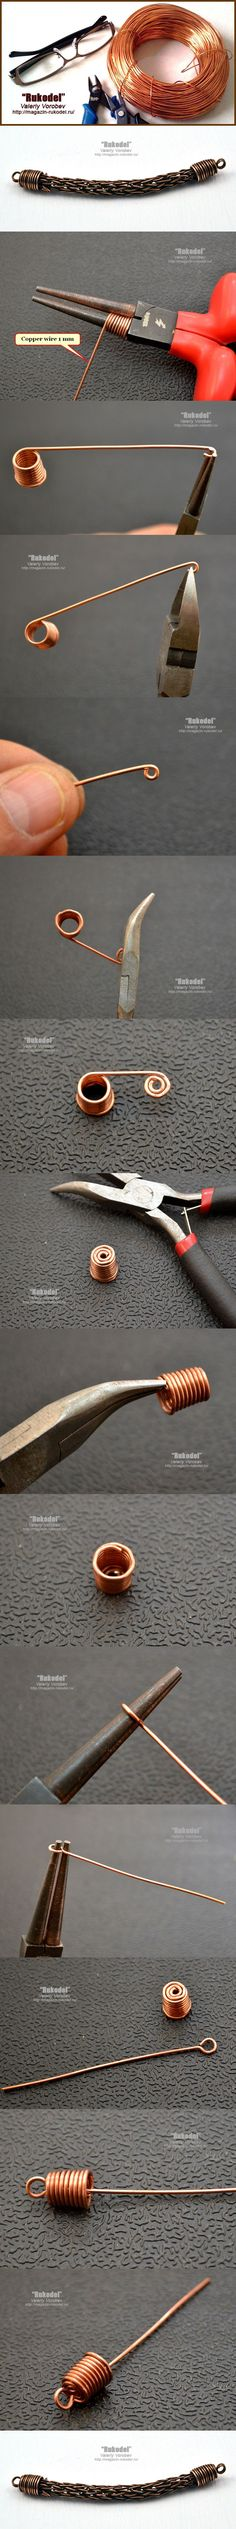 Концевики для бижутерии своими руками. | Рукодел #endcaps #copper #wire